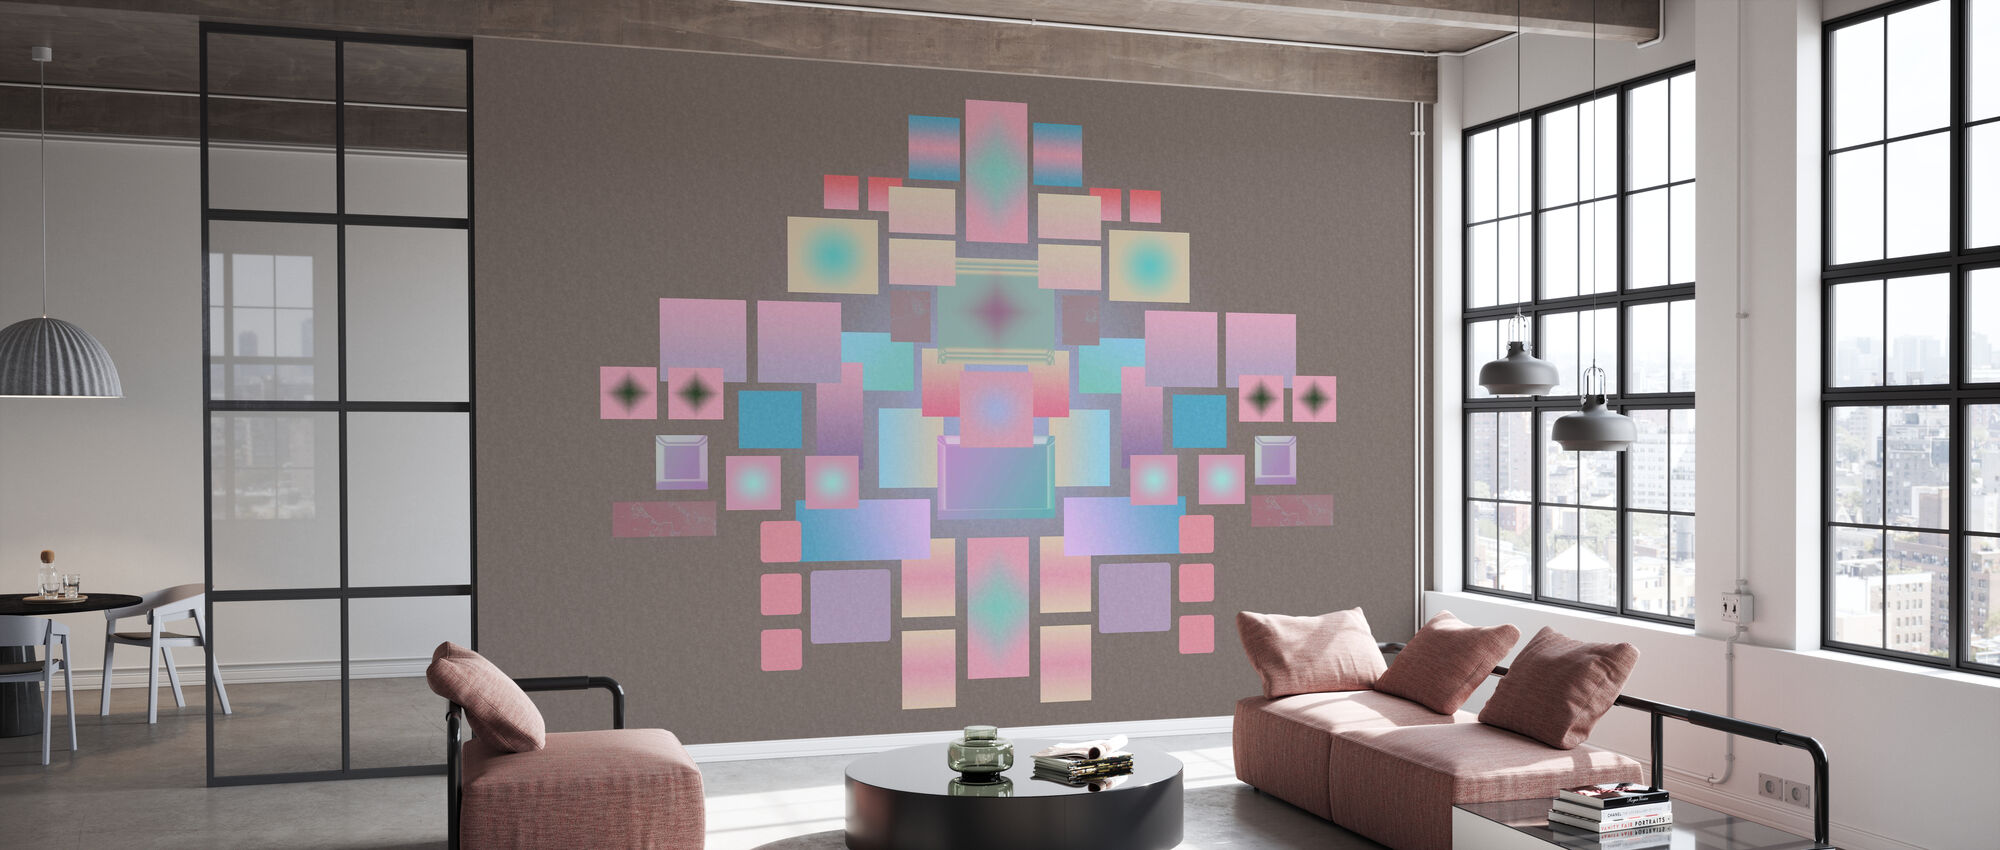 Cosmic Geometrics - Wallpaper - Office